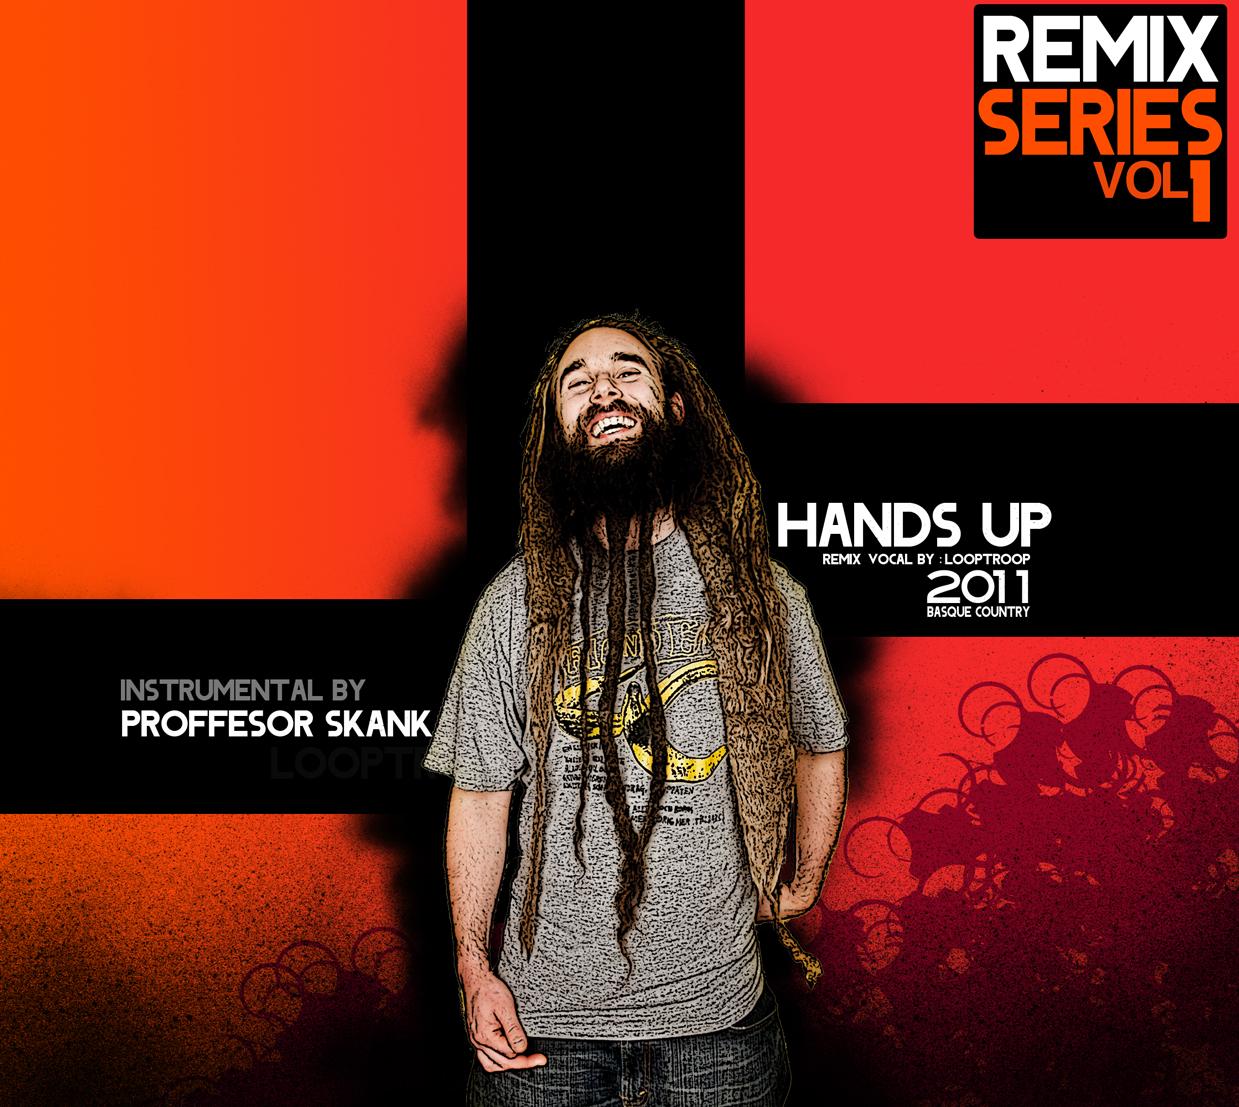 Remix-Series-Vol-1---Hands-Up